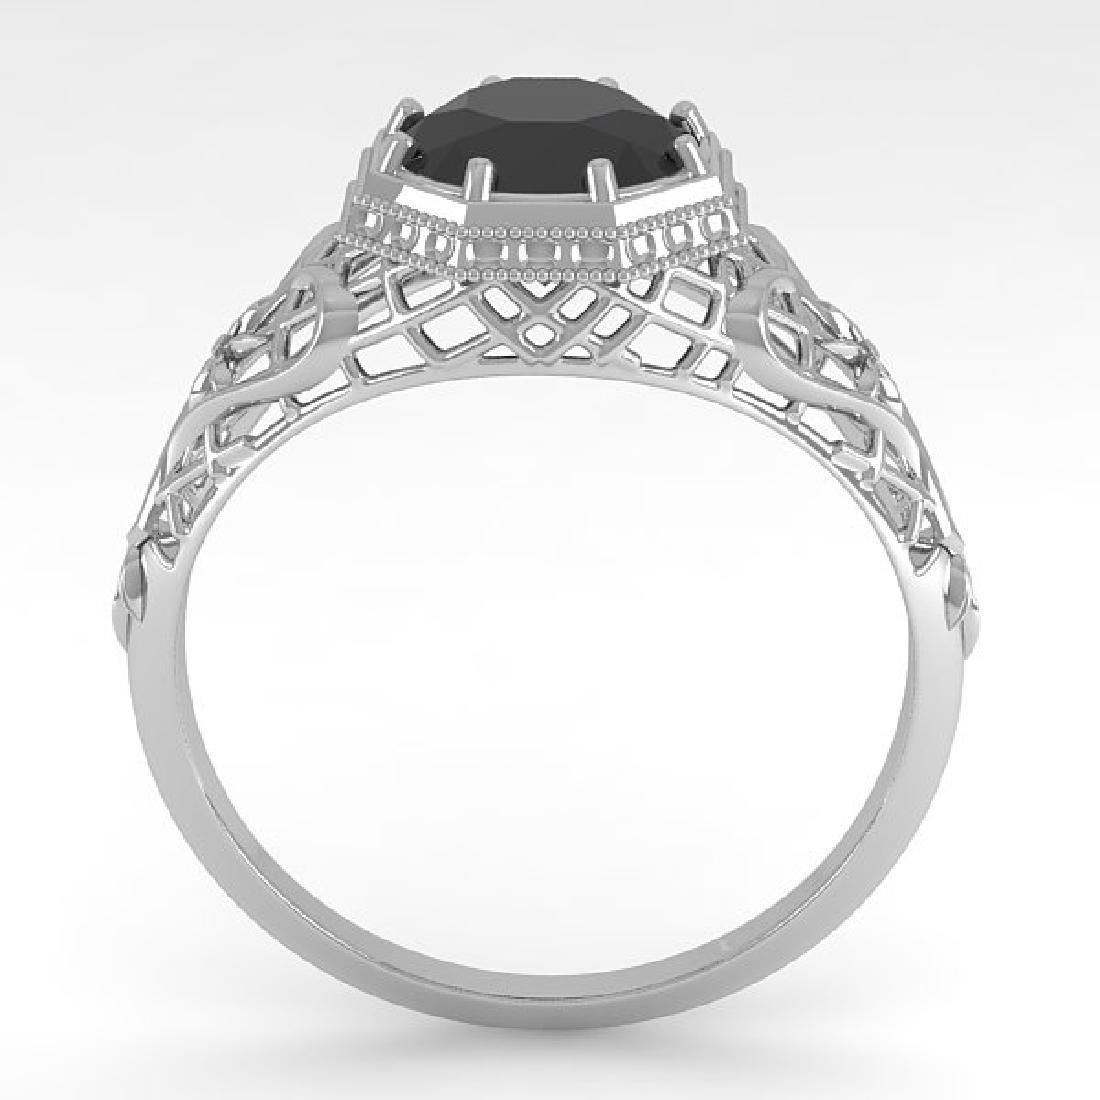 1.50 CTW Black Certified Diamond Ring Art Deco 14K - 3